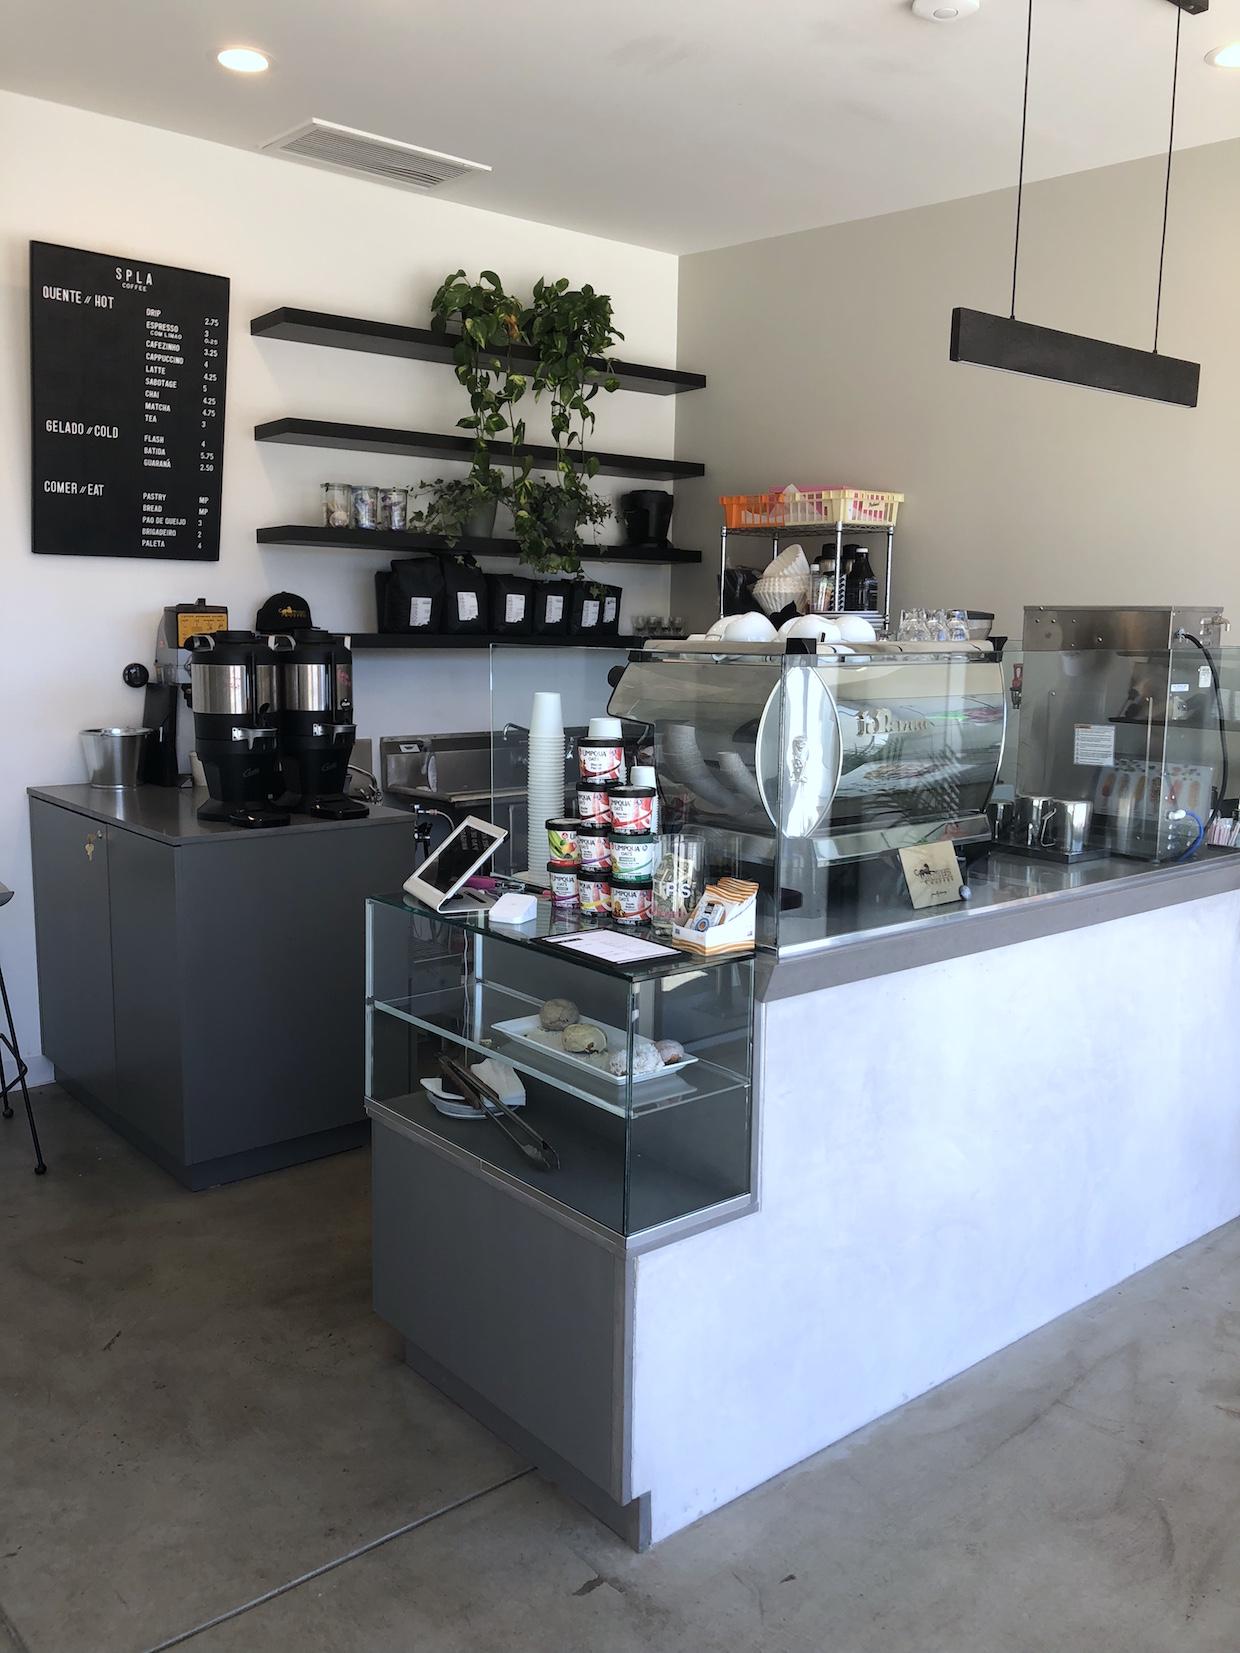 SPLA Coffee Los Angeles Brazil